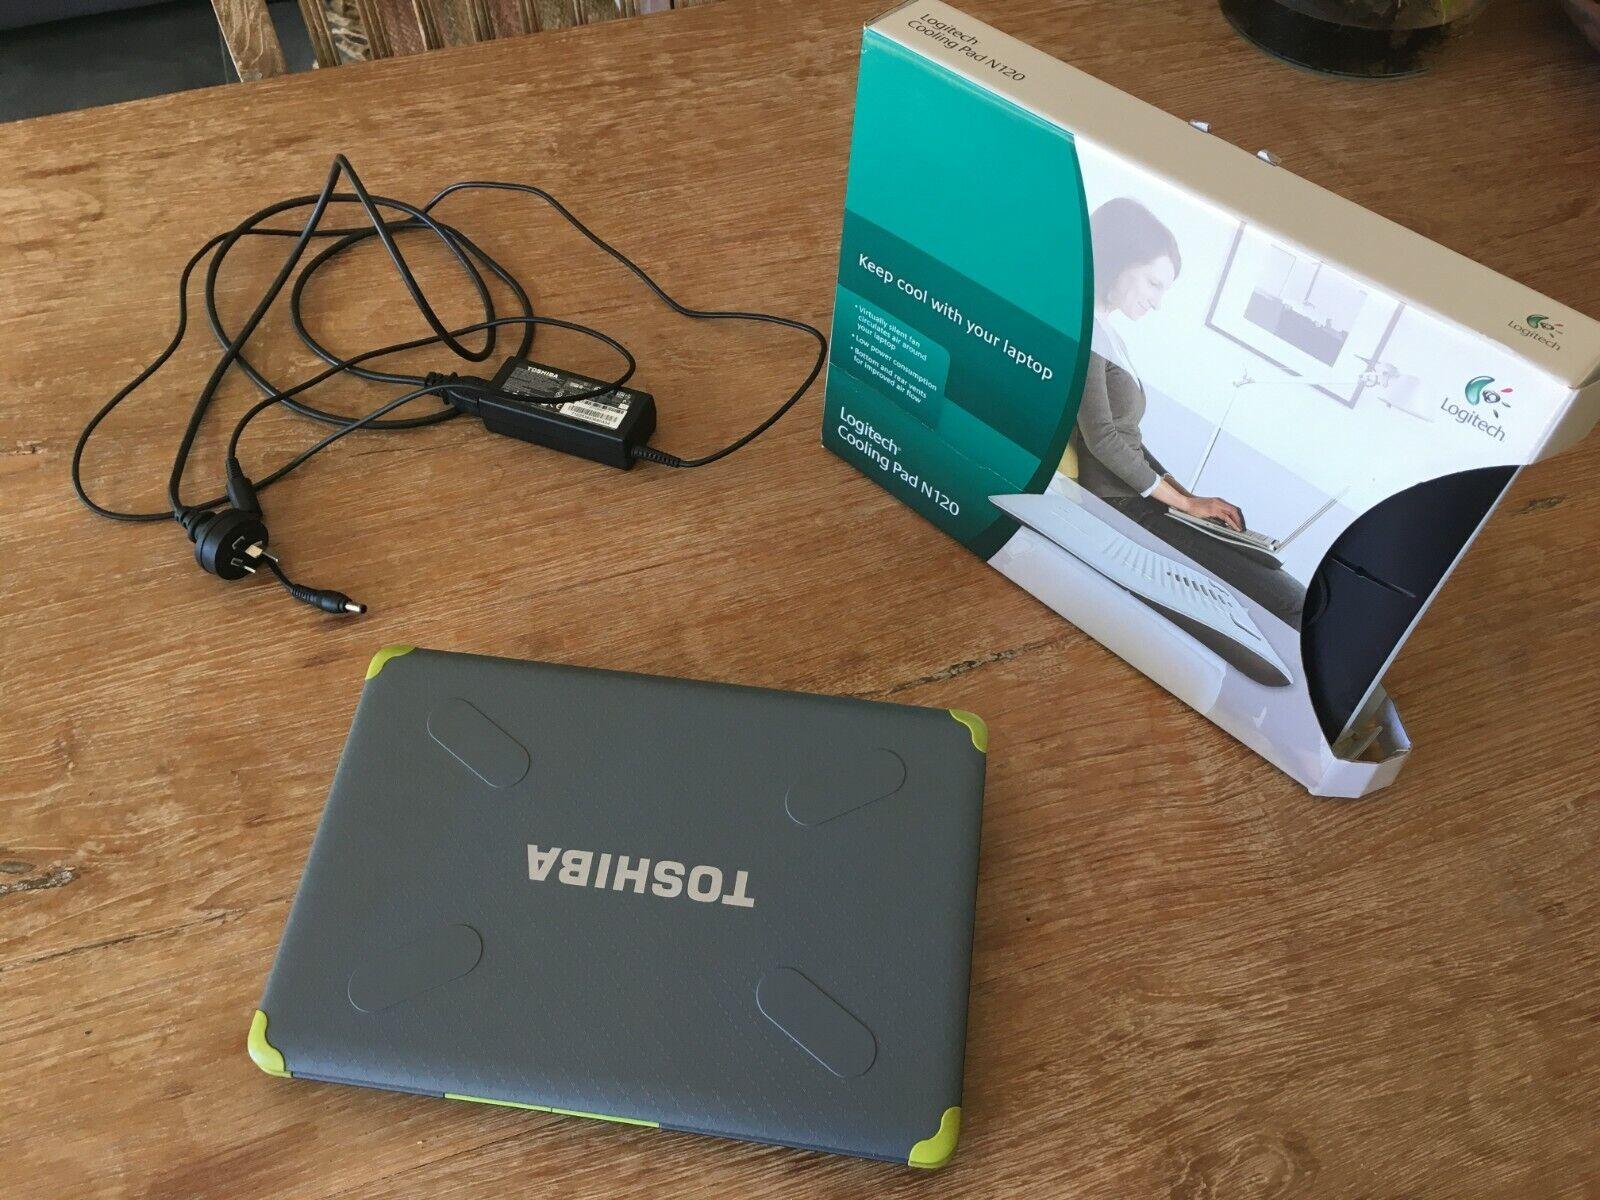 Laptop Windows -  Windows 7 Toshiba Satellite Notebook (L630/00E)